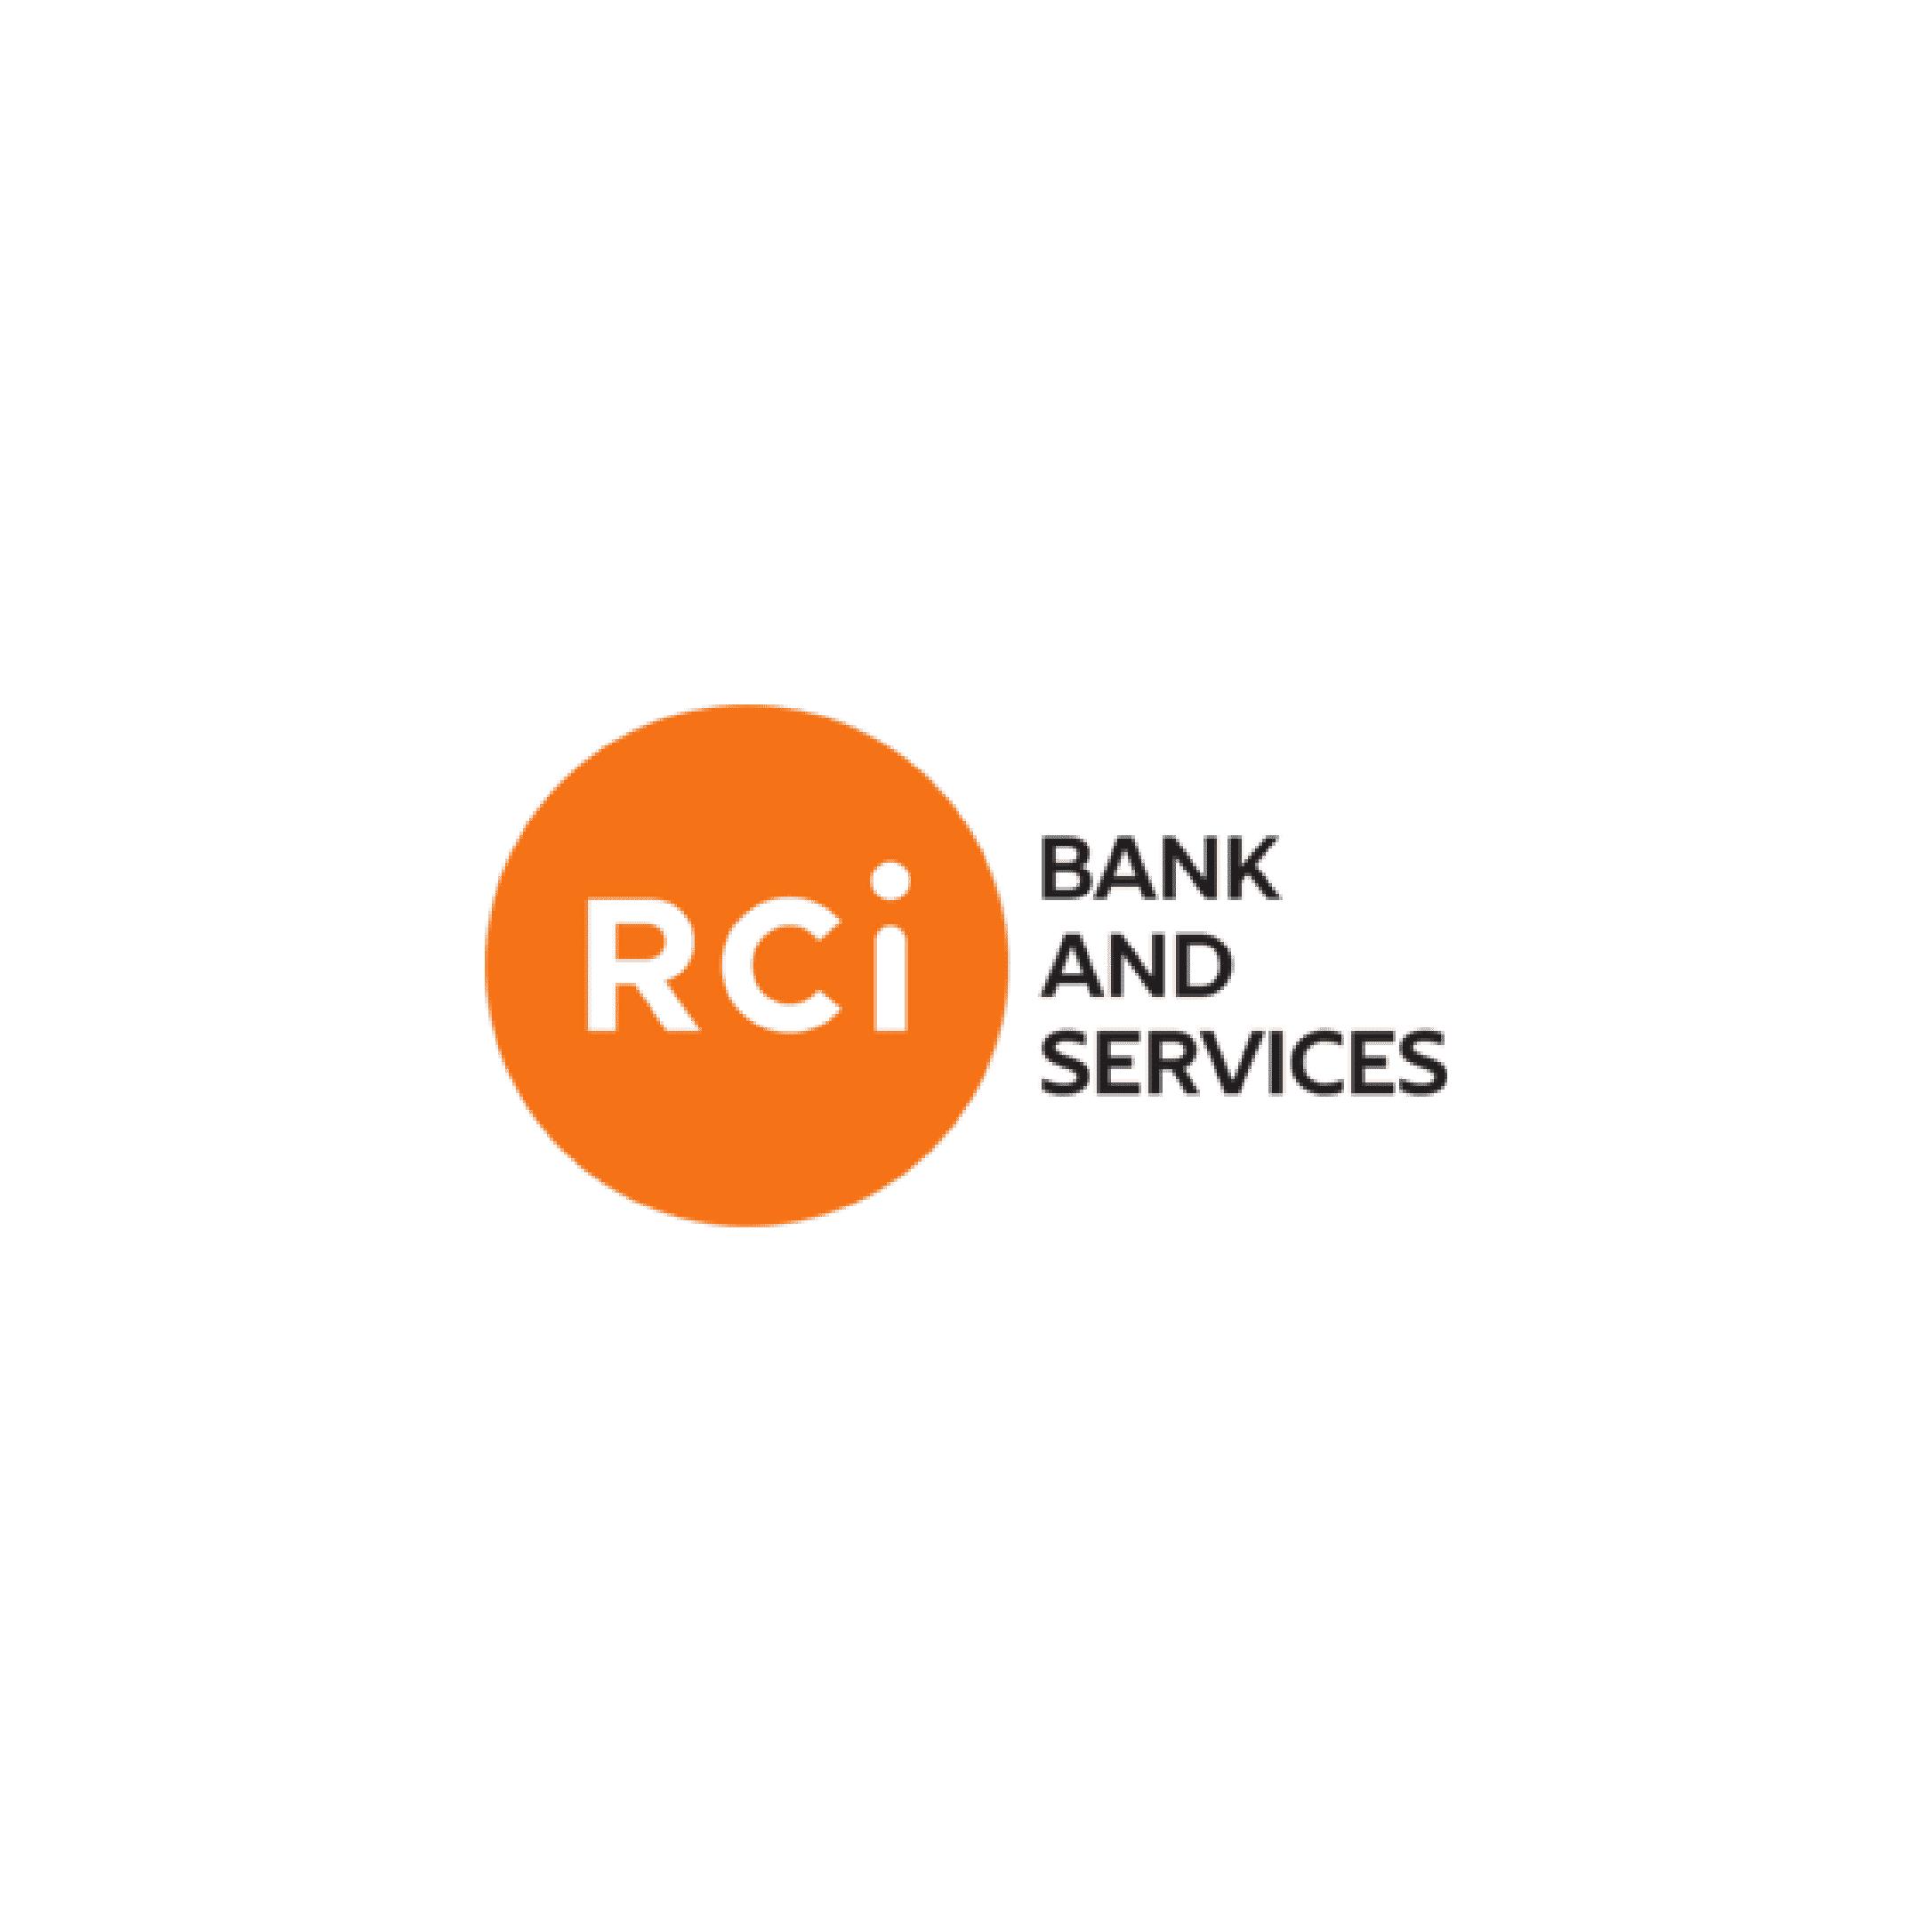 DialOnce-Assurance-RCI-Bank-logo-Assurance